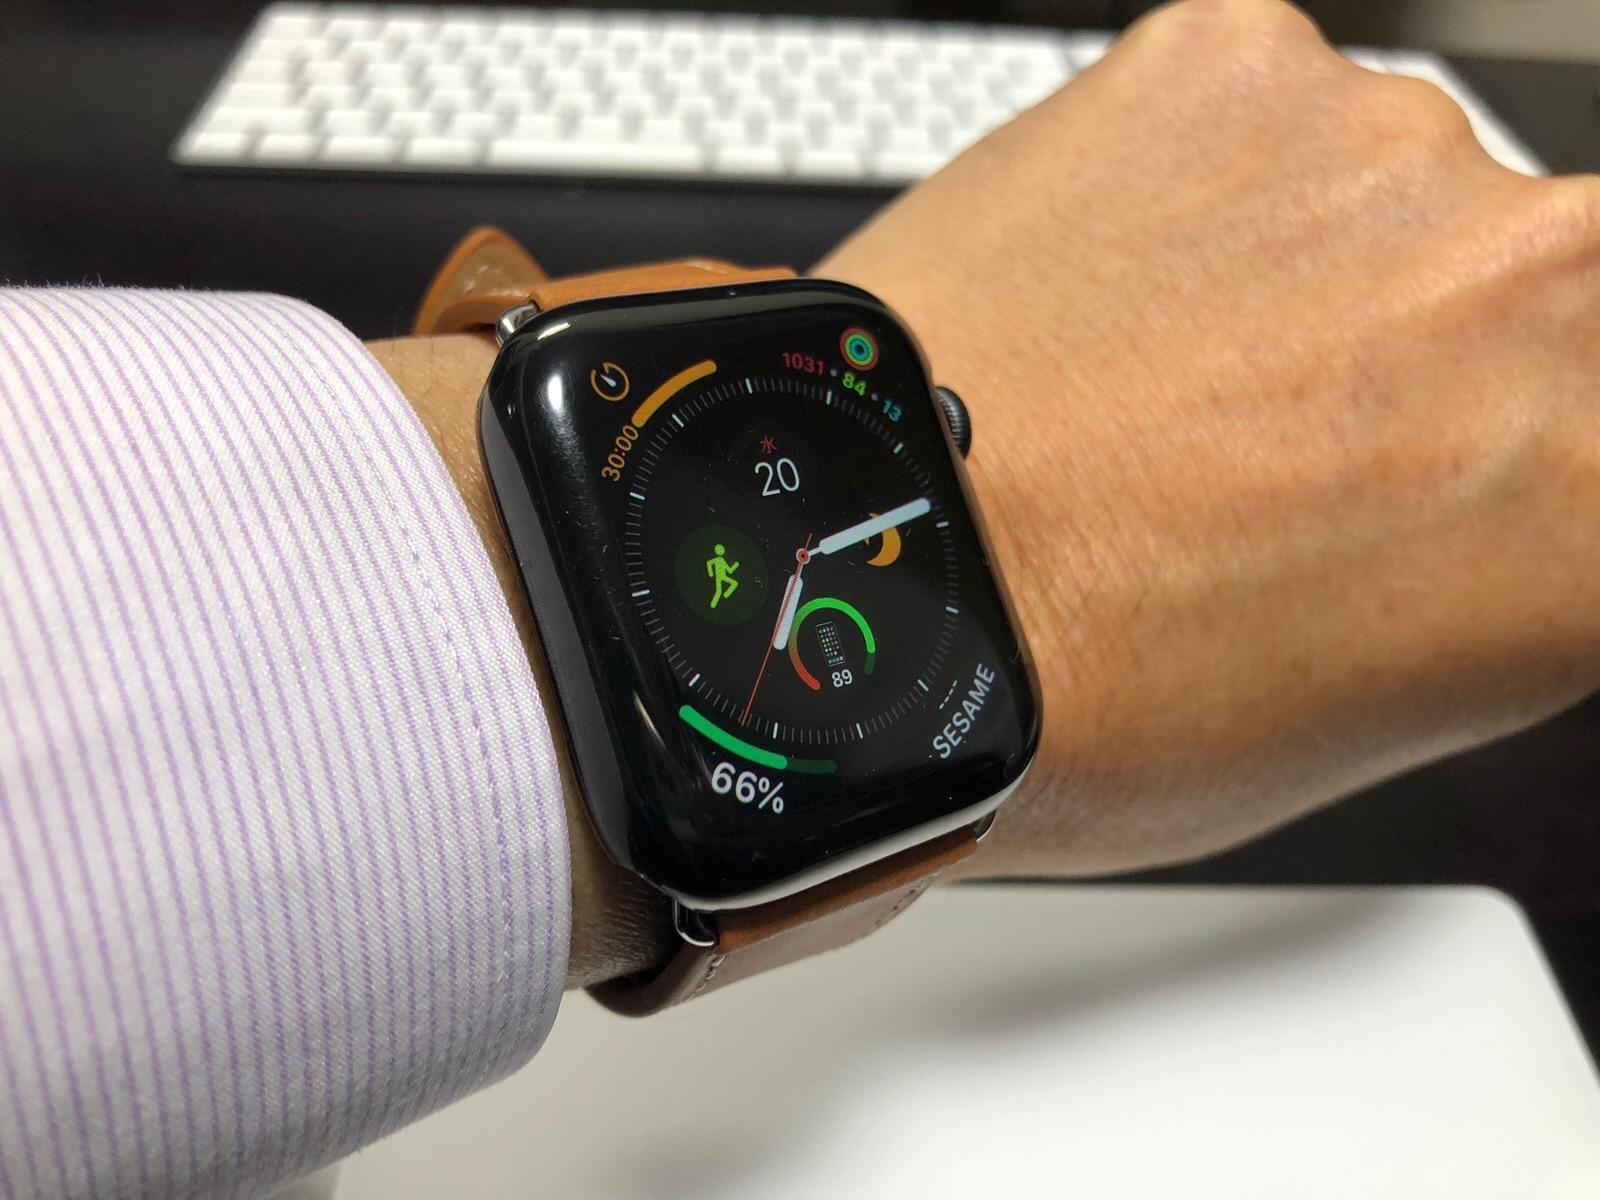 casualcatch Apple watch4 ケース 保護ケース カバー PCケース 傷を防止 防塵 耐衝撃性 44mm-5